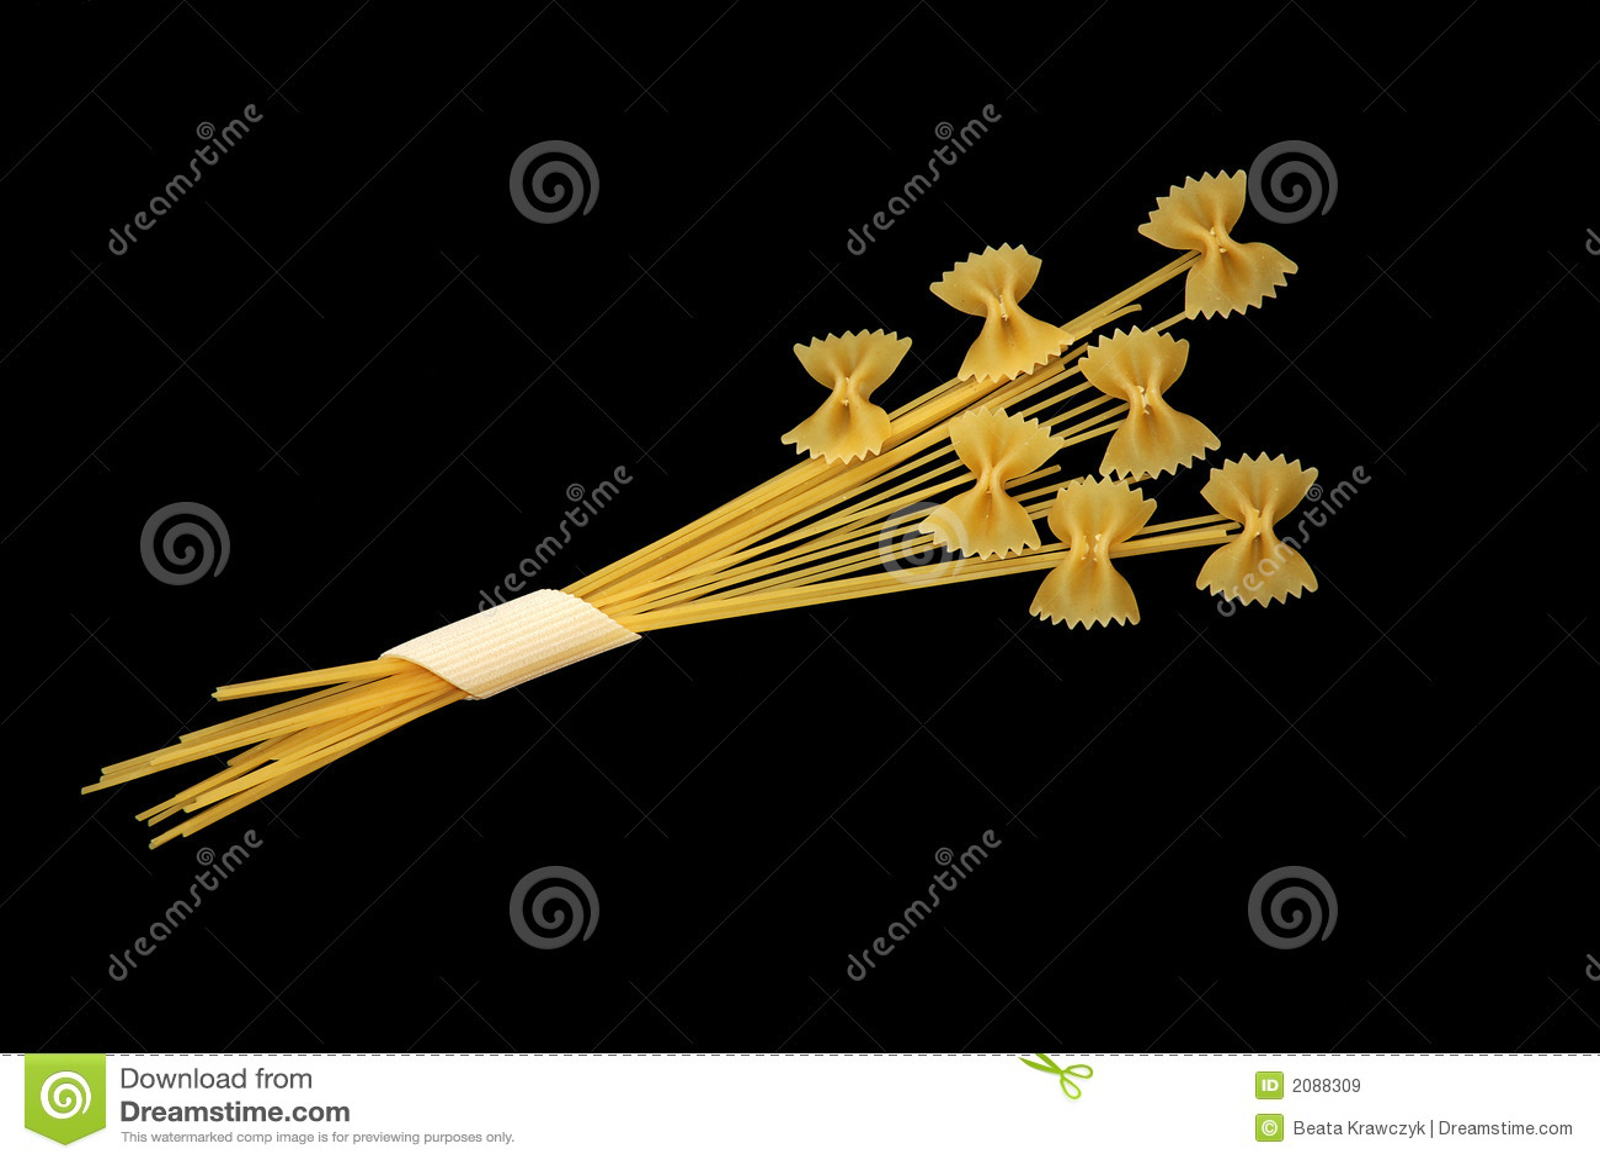 Pasta flowers